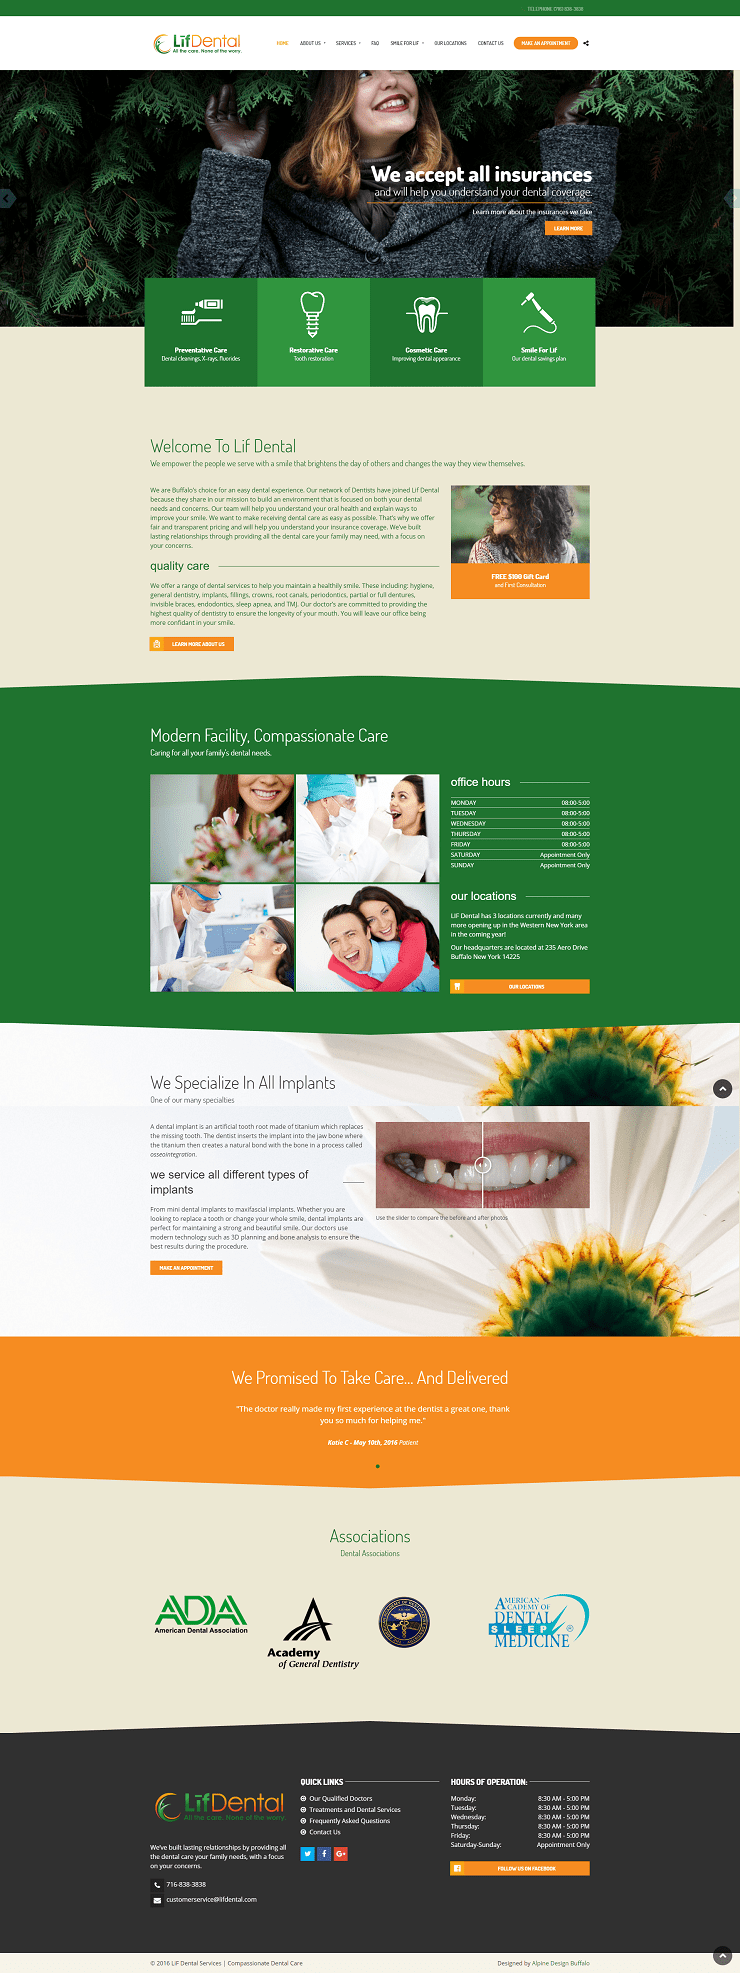 Lif Dental